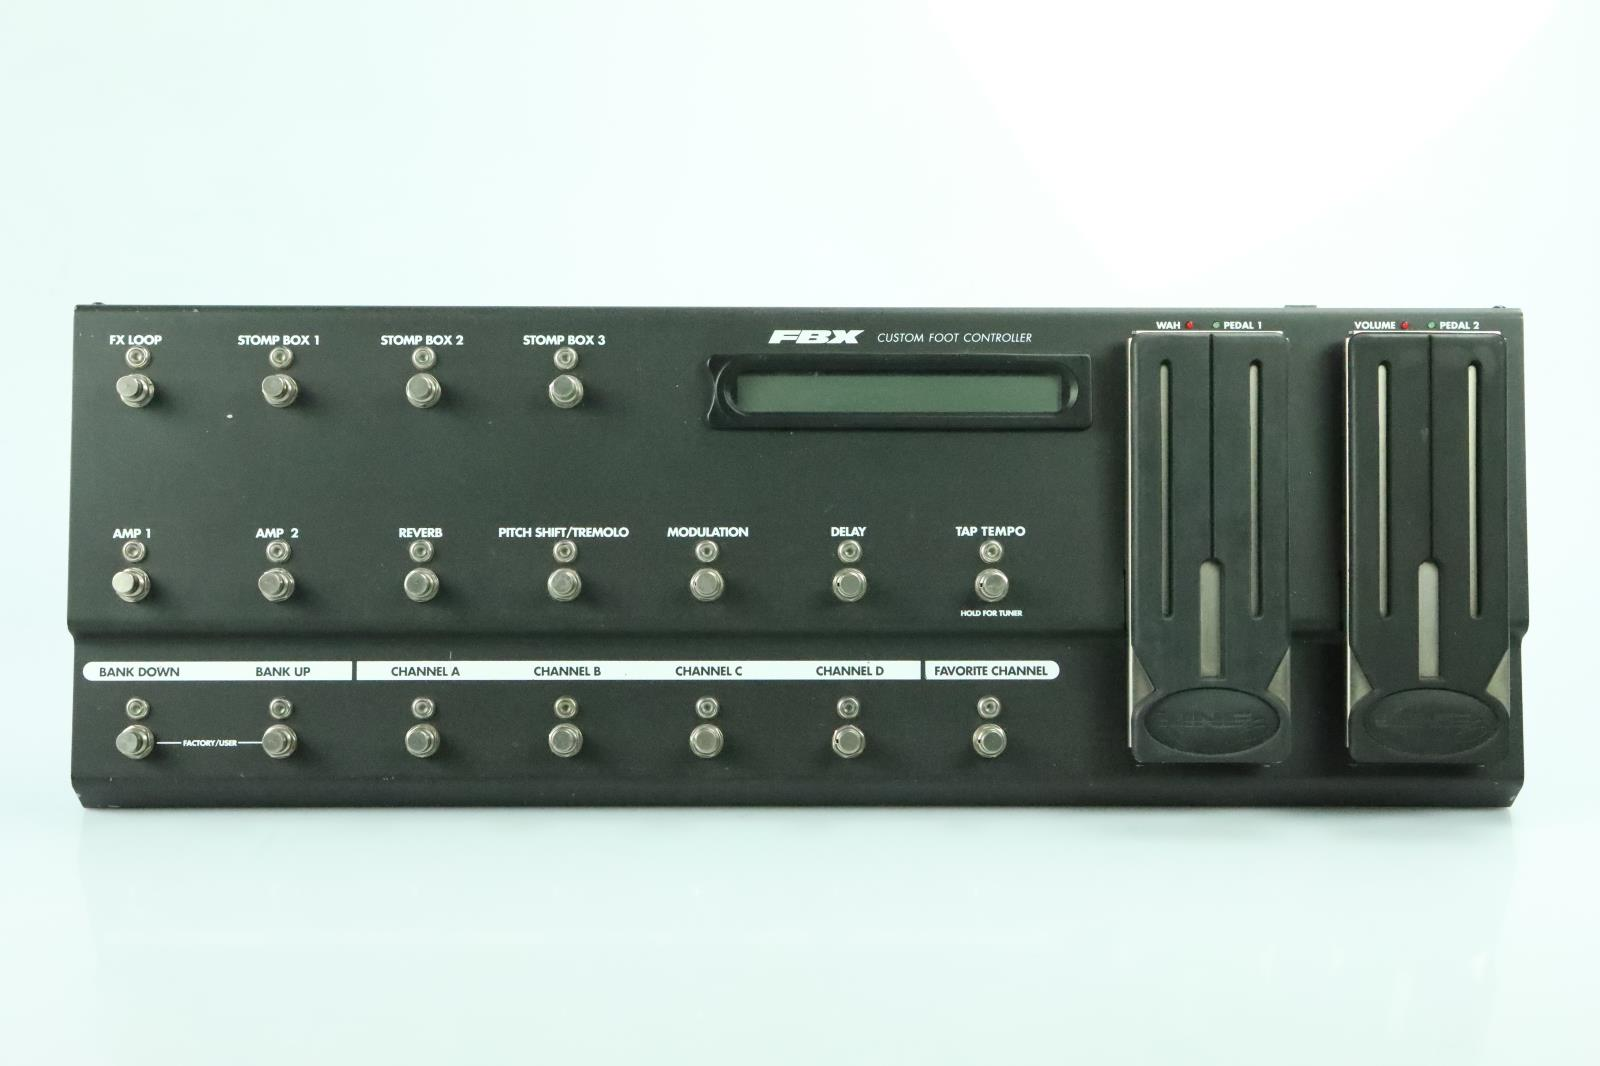 Line 6 FBV Custom Foot Controller Longboard Long Owned by Carlos Rios #33970